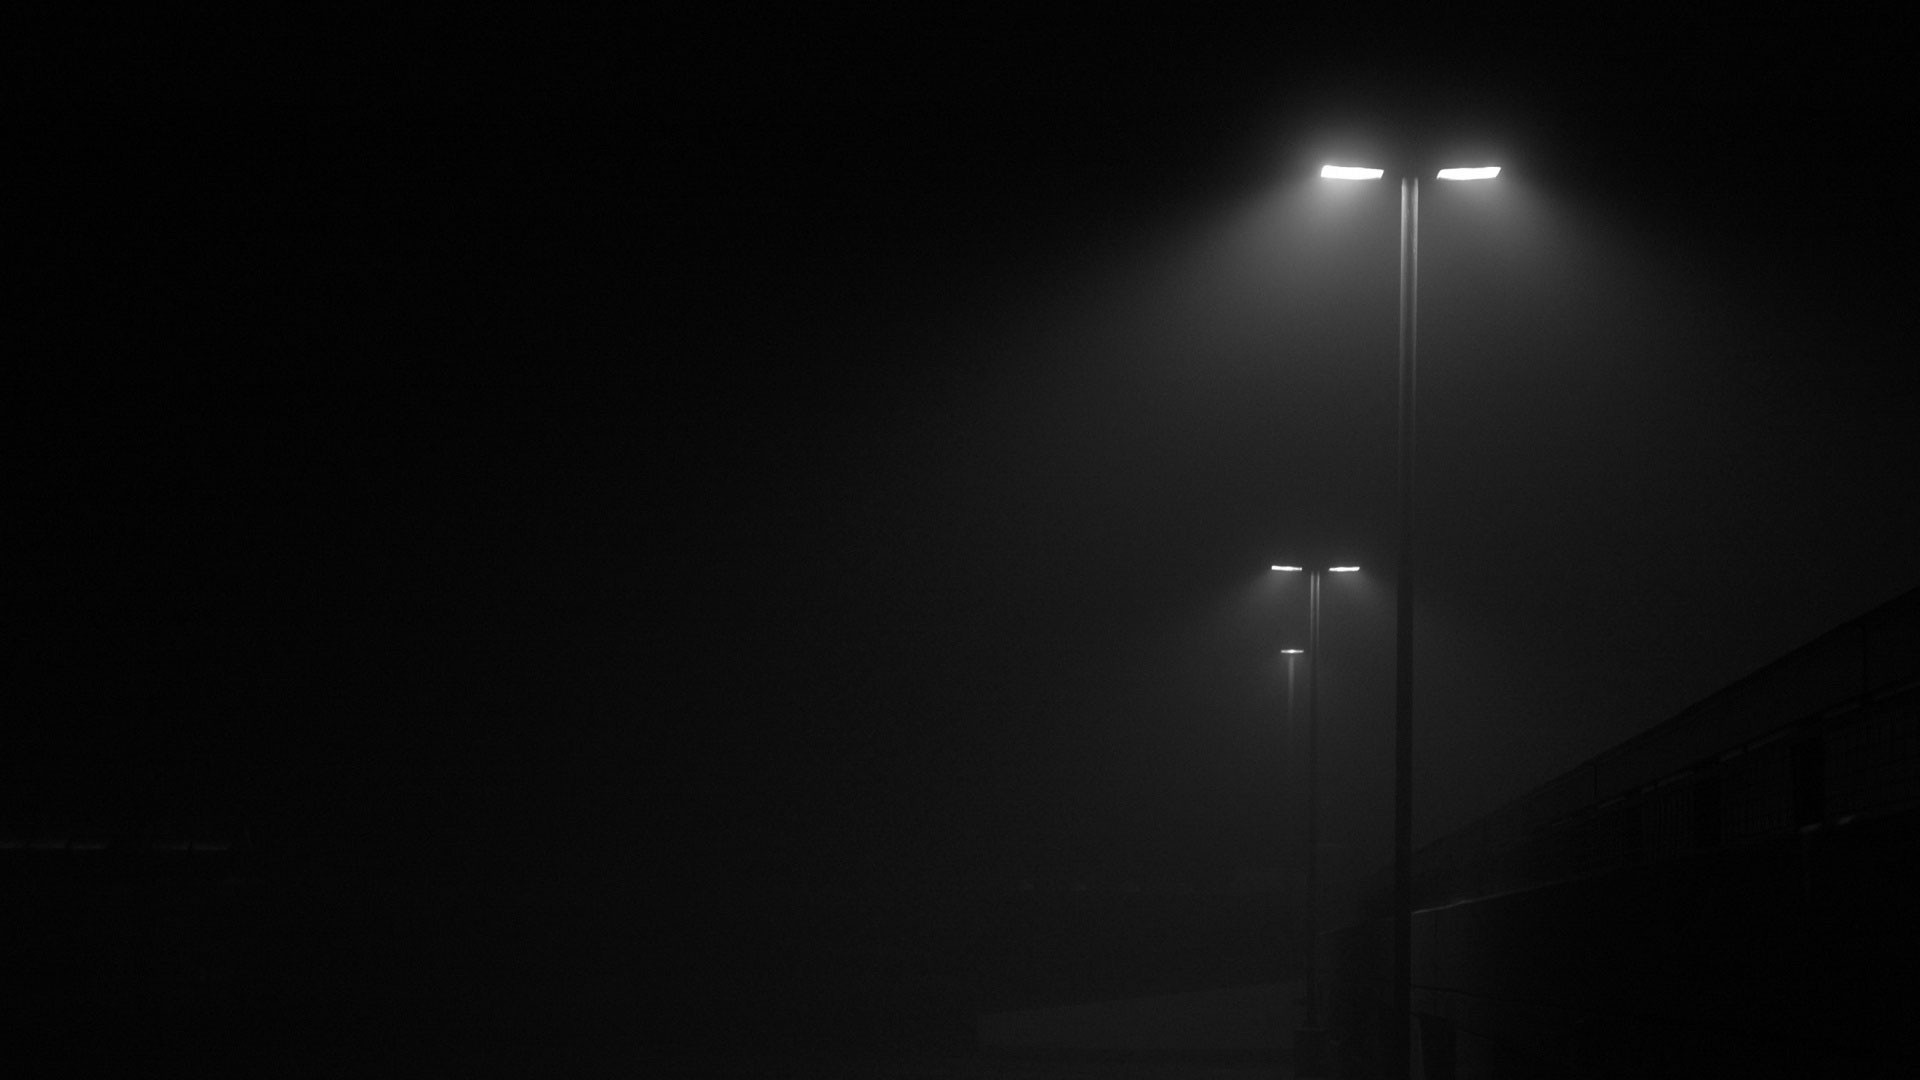 Street Light HD Artist 4k Wallpapers Images Backgrounds Photos